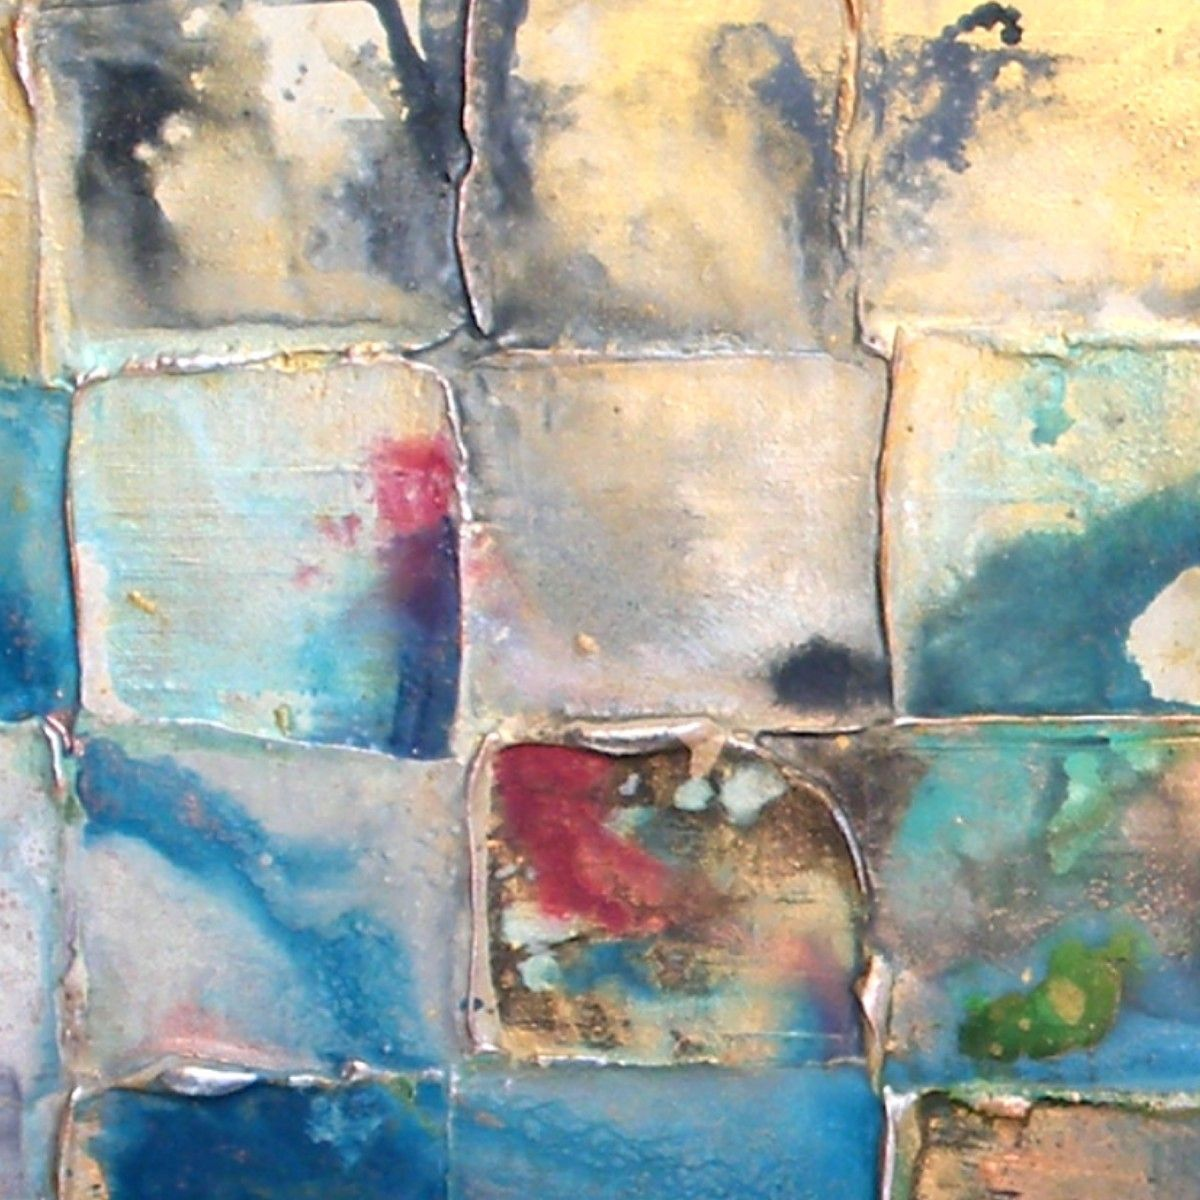 Urban Decay 2016 Acrylic Painting By Caroline Ashwood